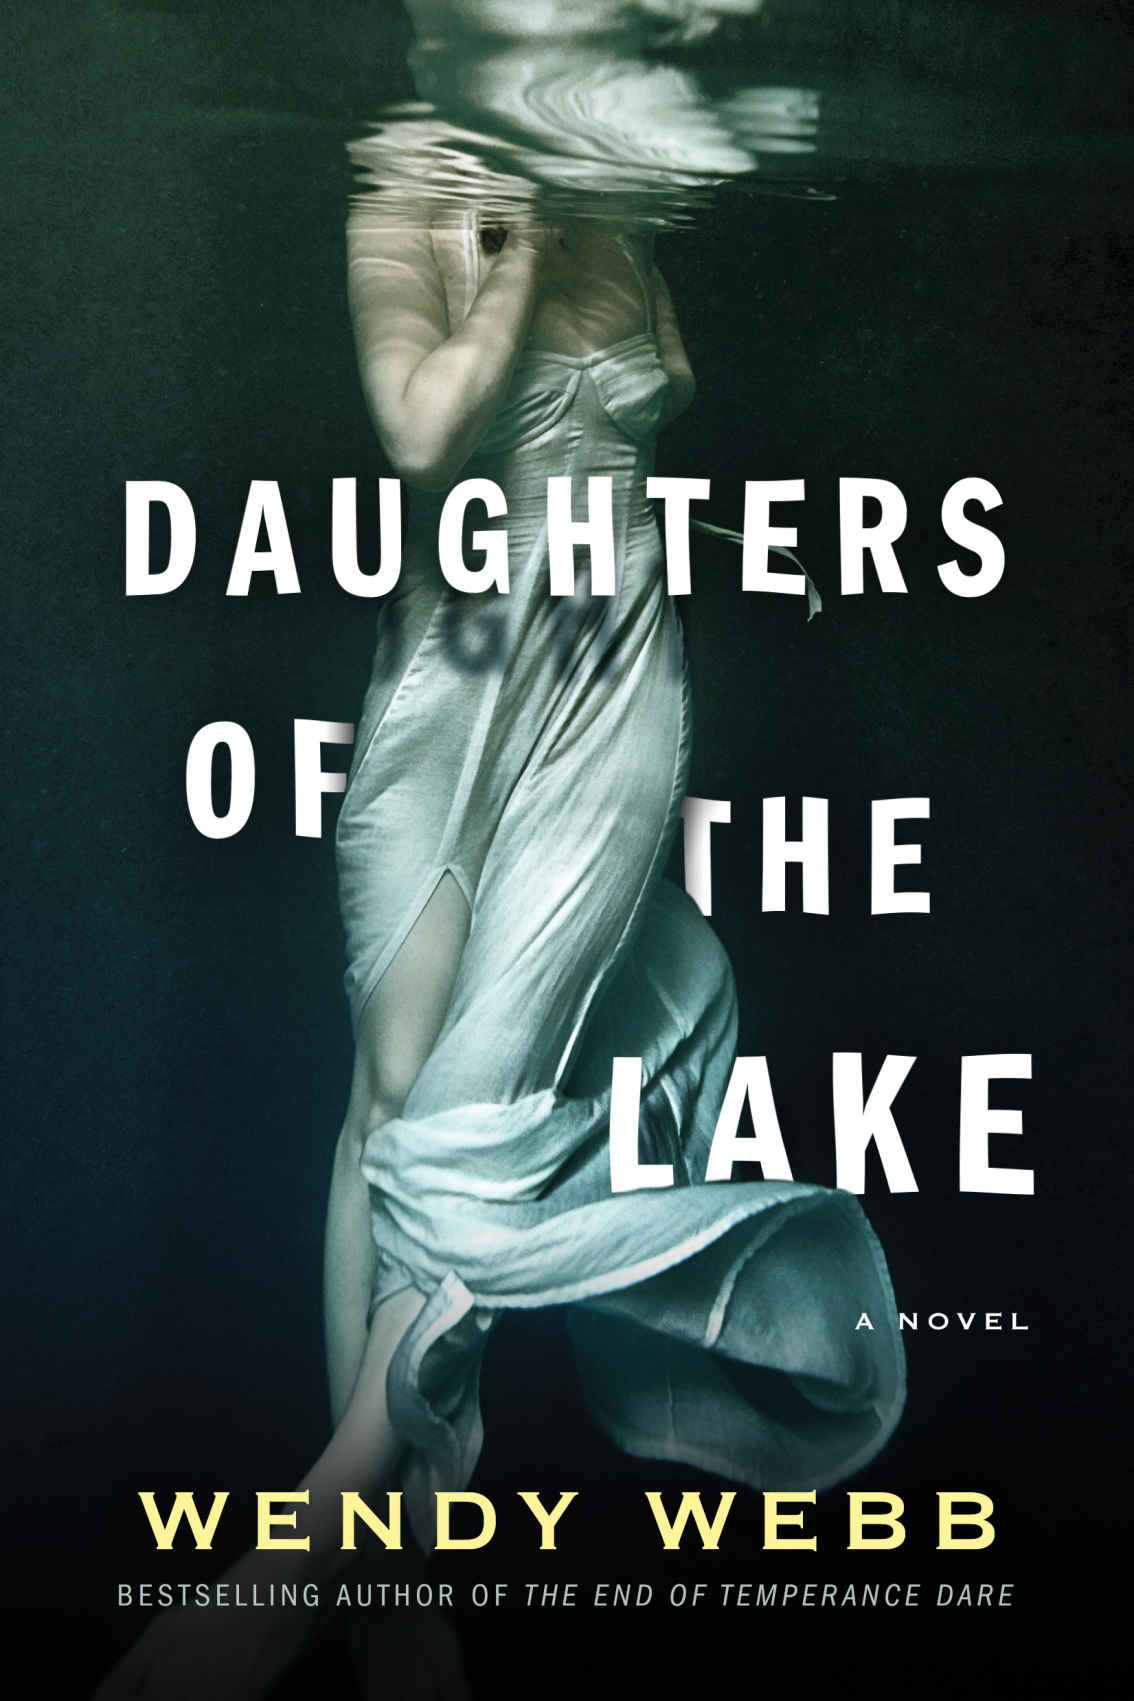 Daughters of the Lake - Wendy Webb [kindle] [mobi]